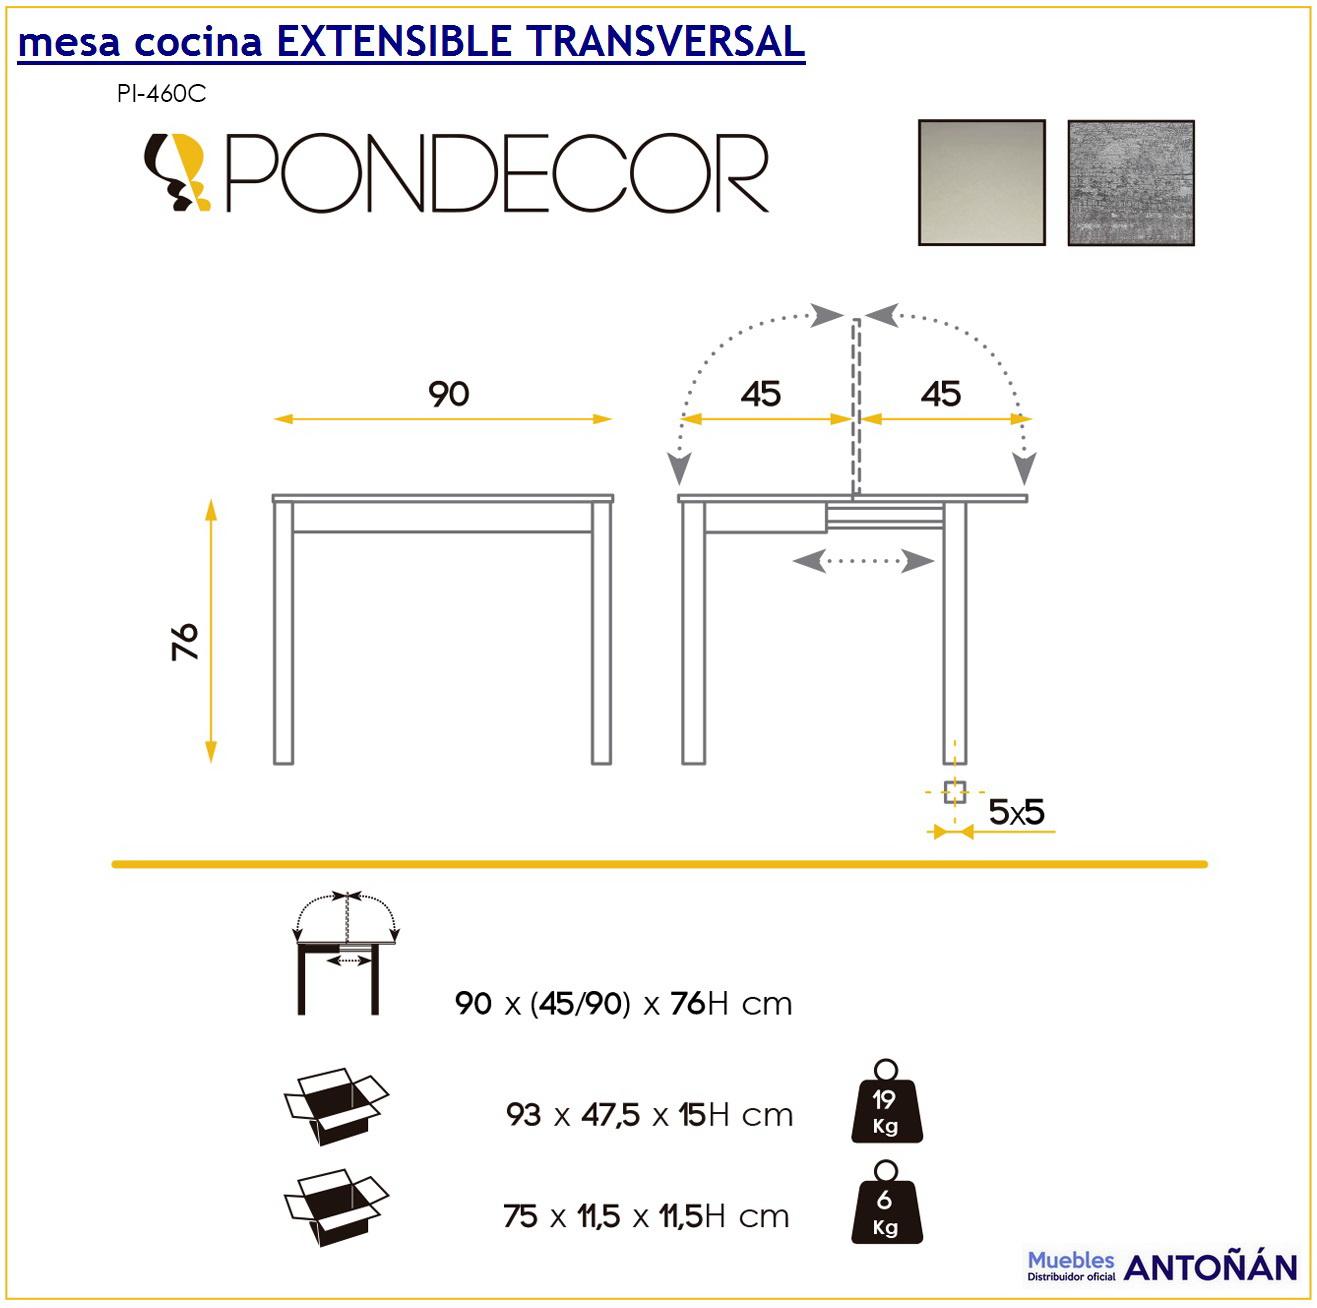 Mesa cocina EXTENSIBLE TRANSVERSAL by CMC Unique Pondecor en ...